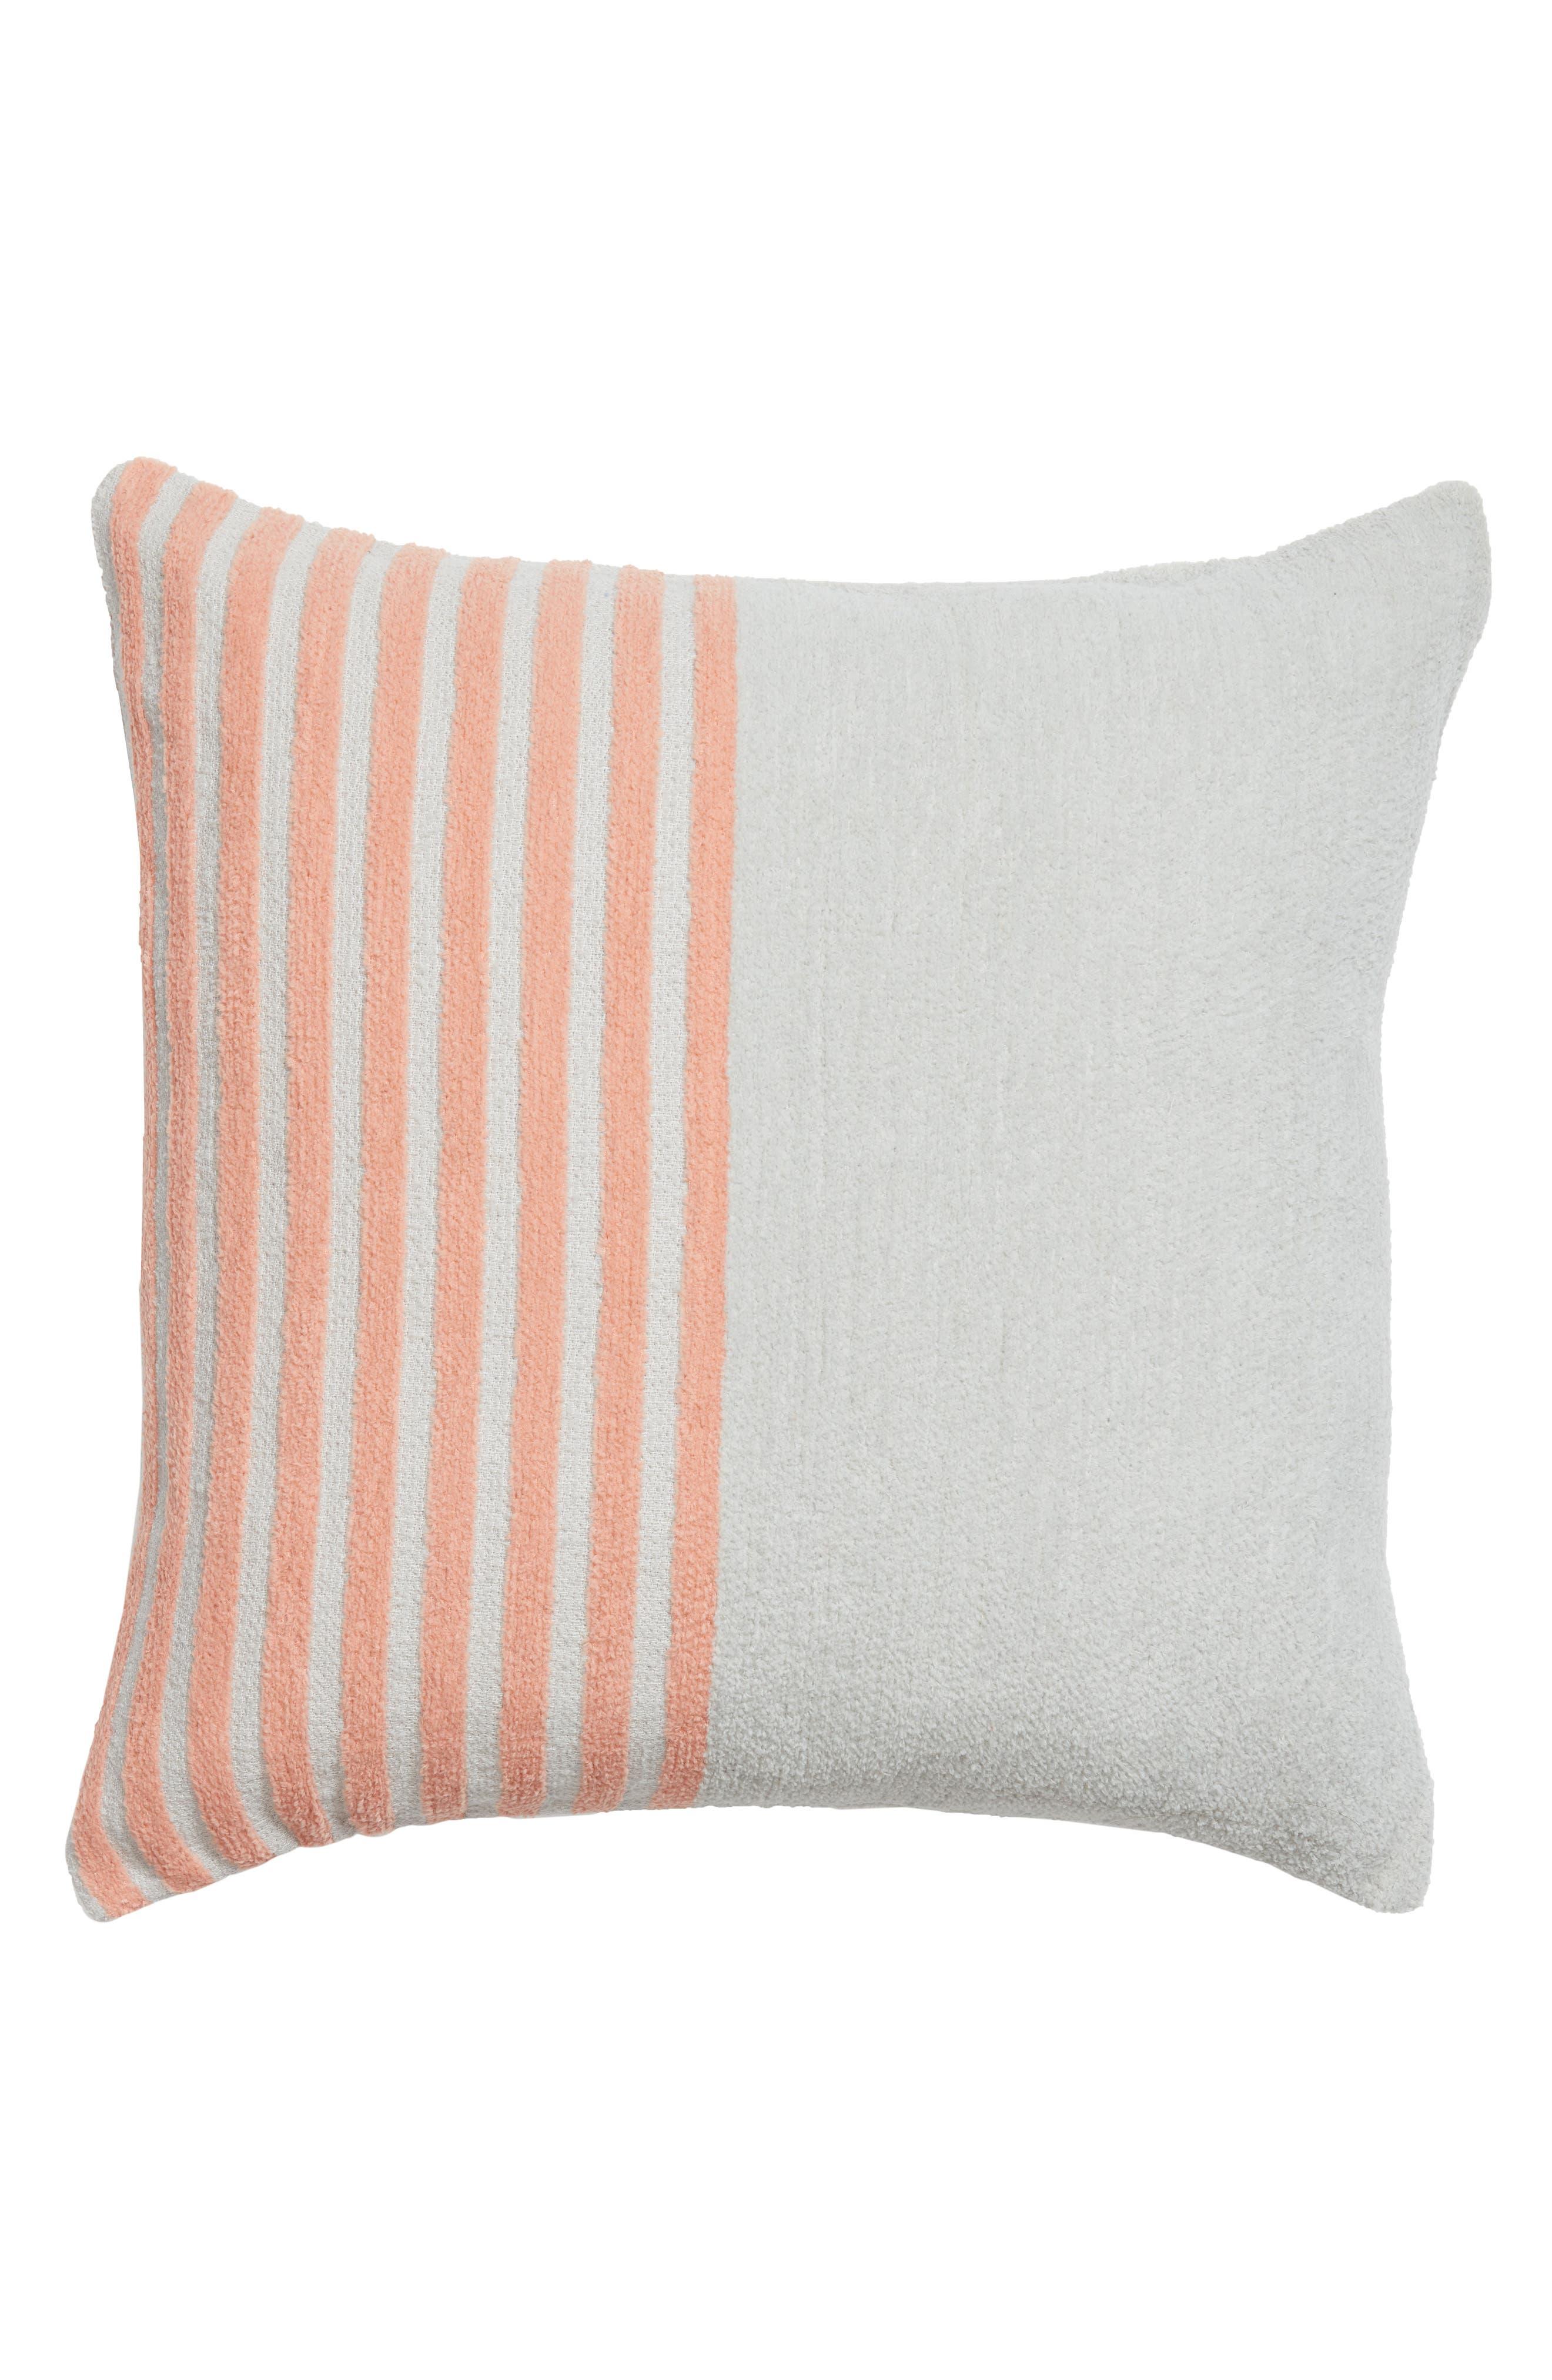 Hammam Stripe Accent Pillow,                             Main thumbnail 1, color,                             Grey Vapor